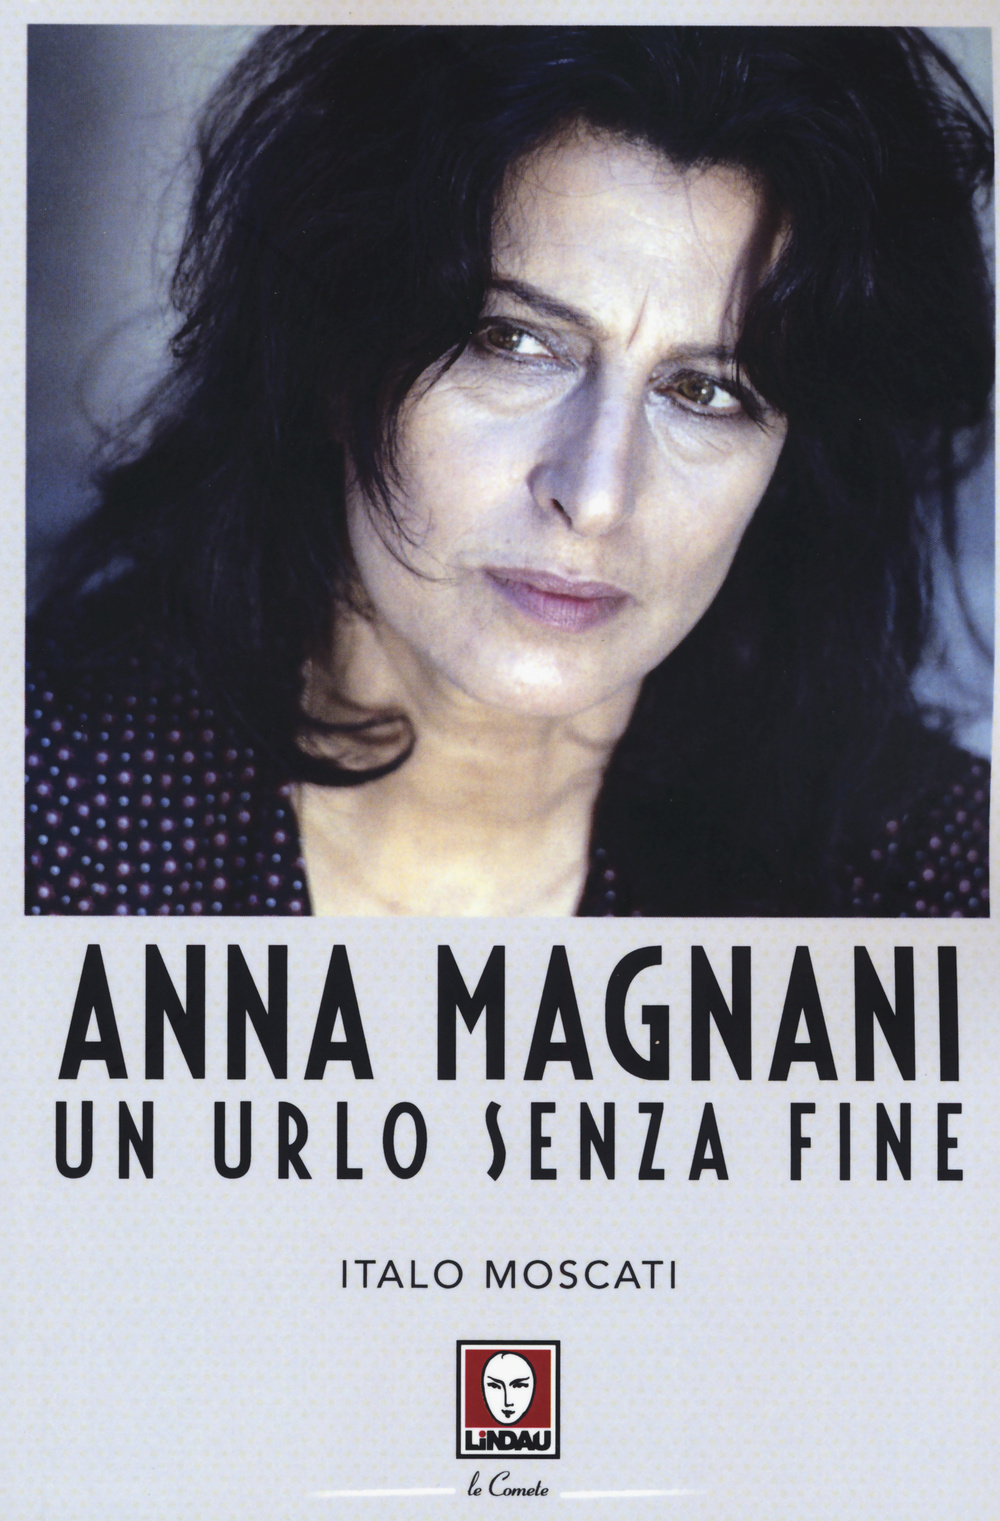 ANNA MAGNANI UN URLO SENZA FINE - 9788867083589